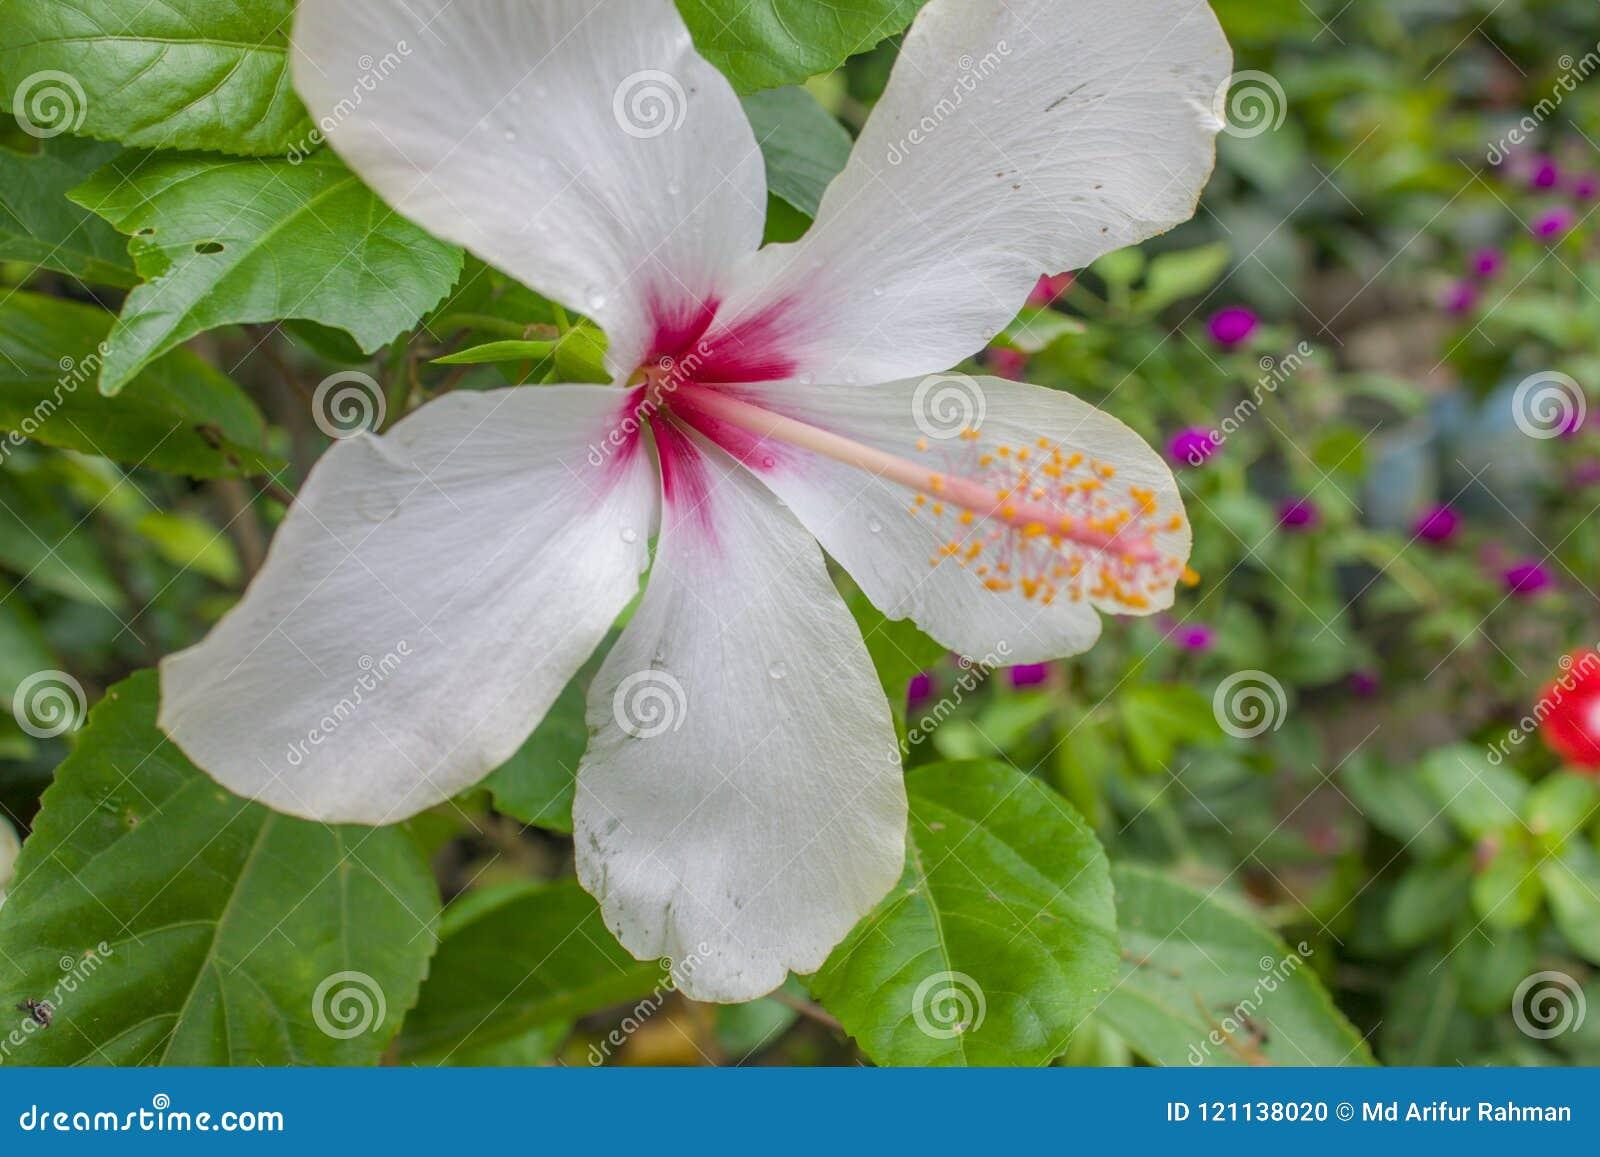 White China Rose Flower At Garden White Hibiscus Flower Stock